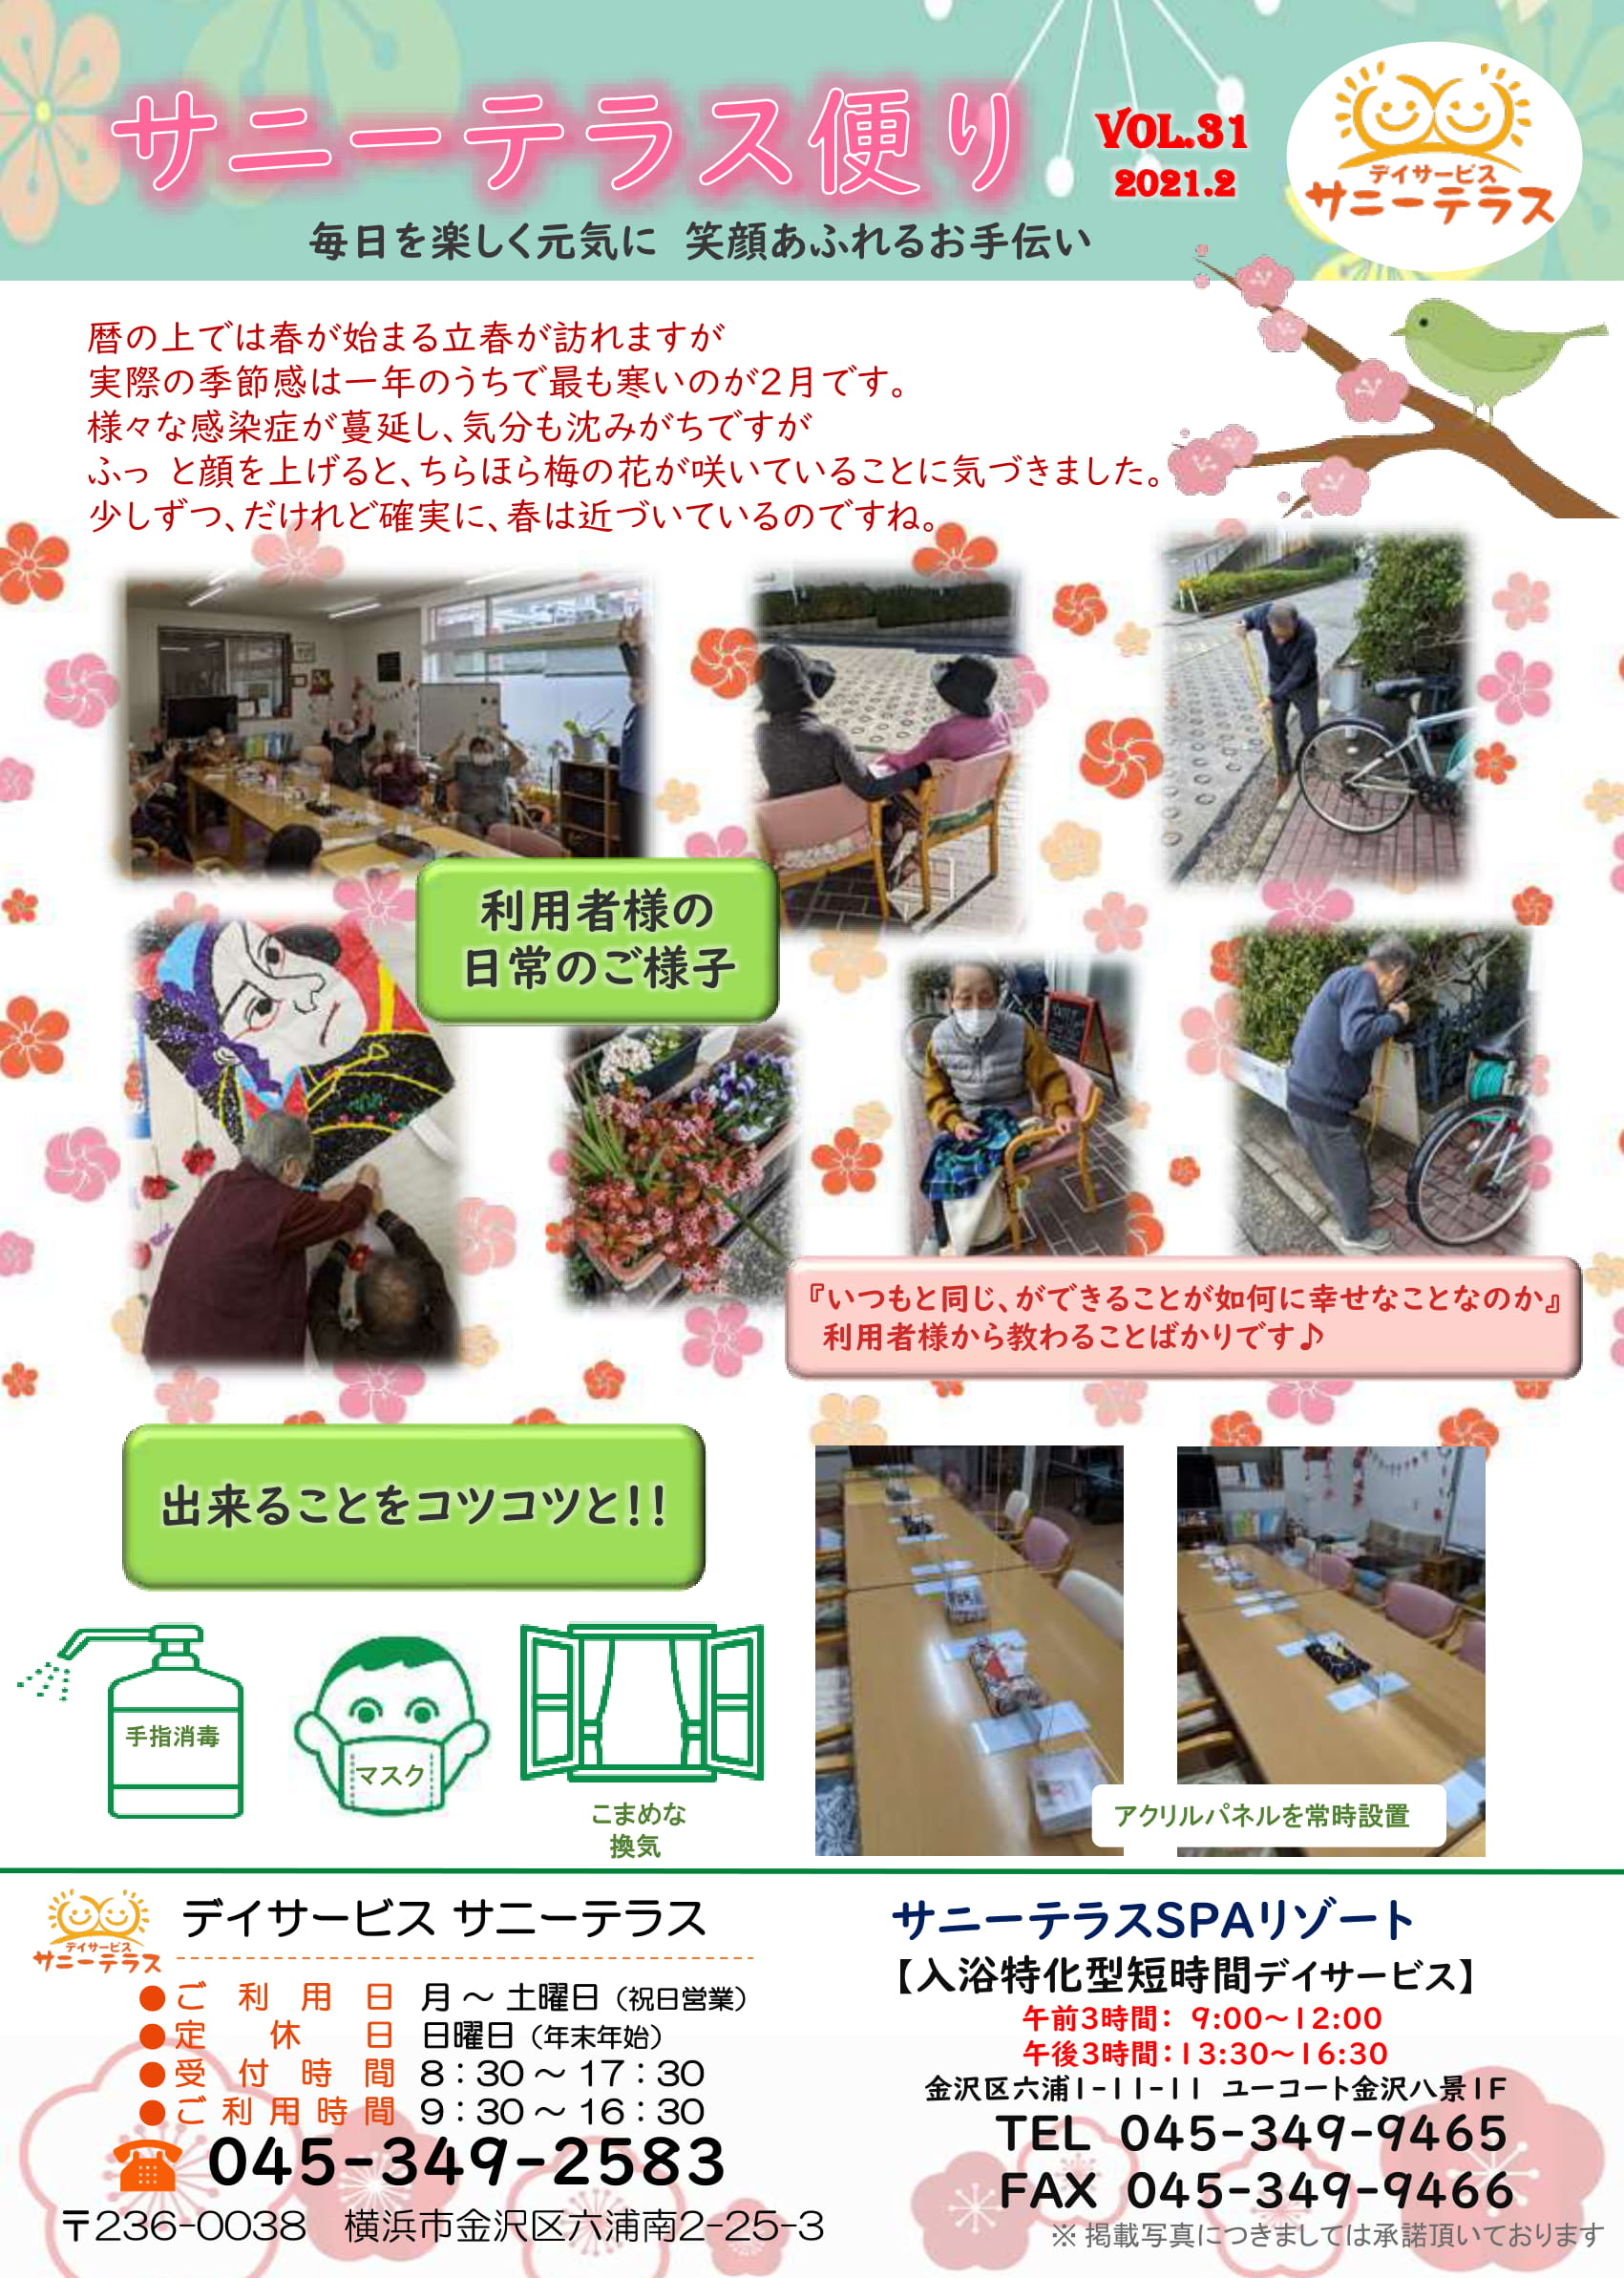 Vol.31-1.jpg